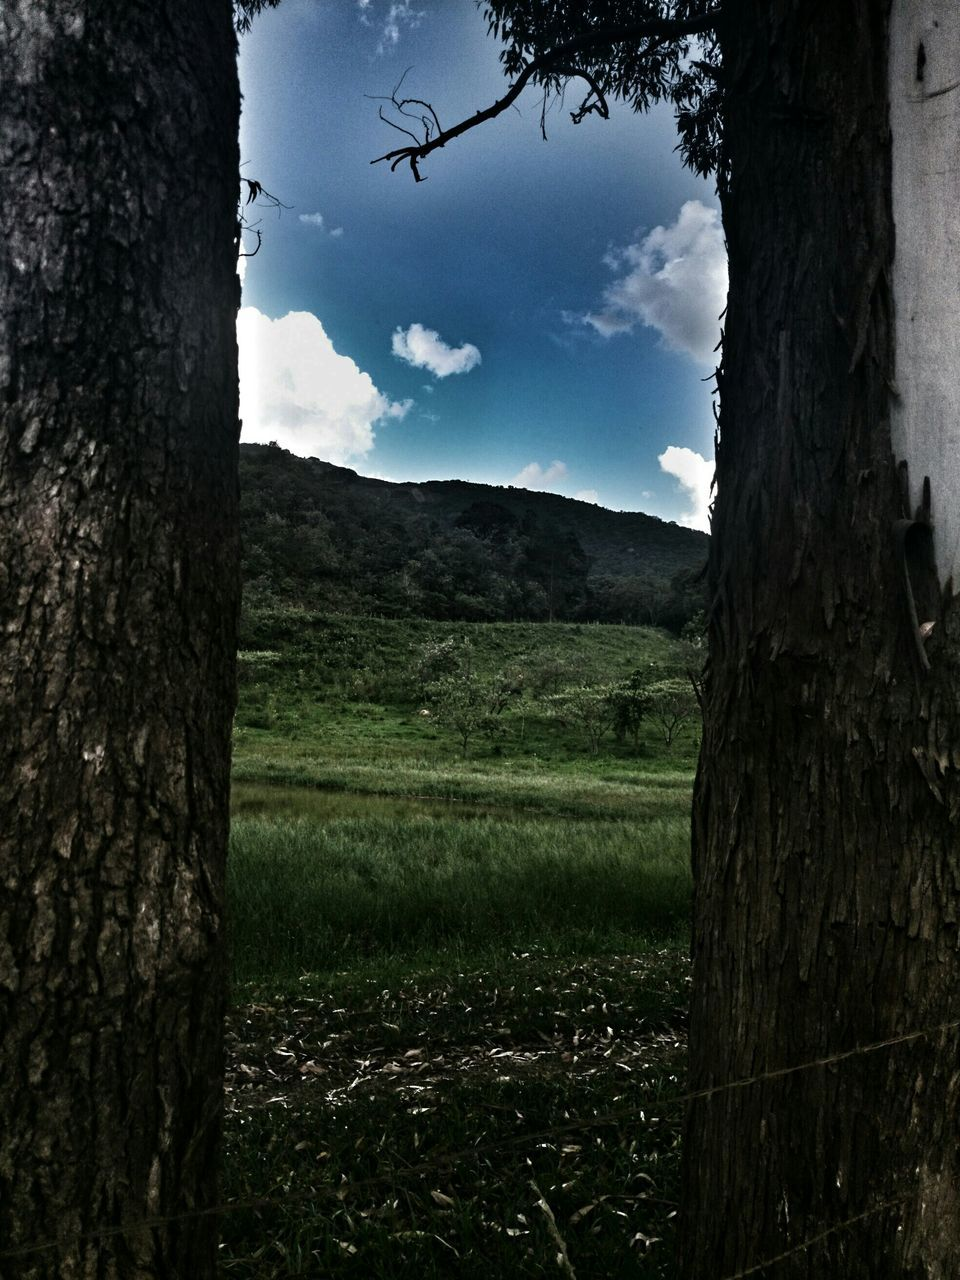 Field Seen Through Trees